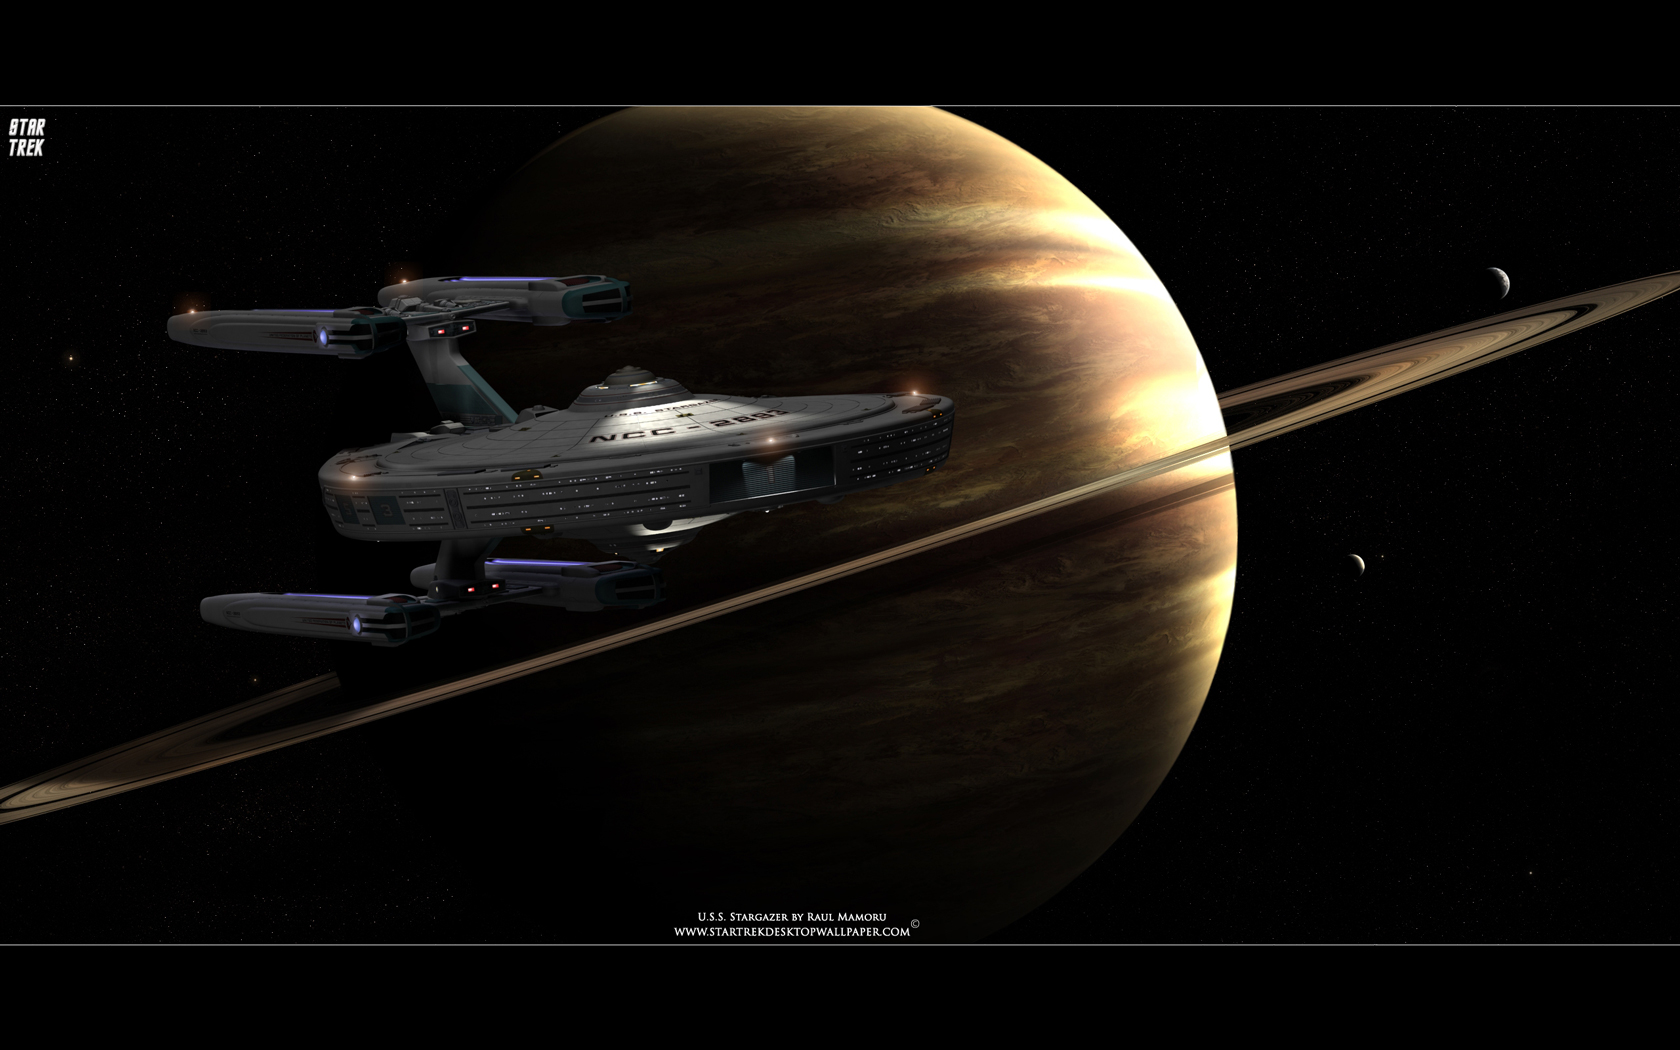 Star Trek USS Stargazer   Star Trek computer desktop wallpaper 1680x1050